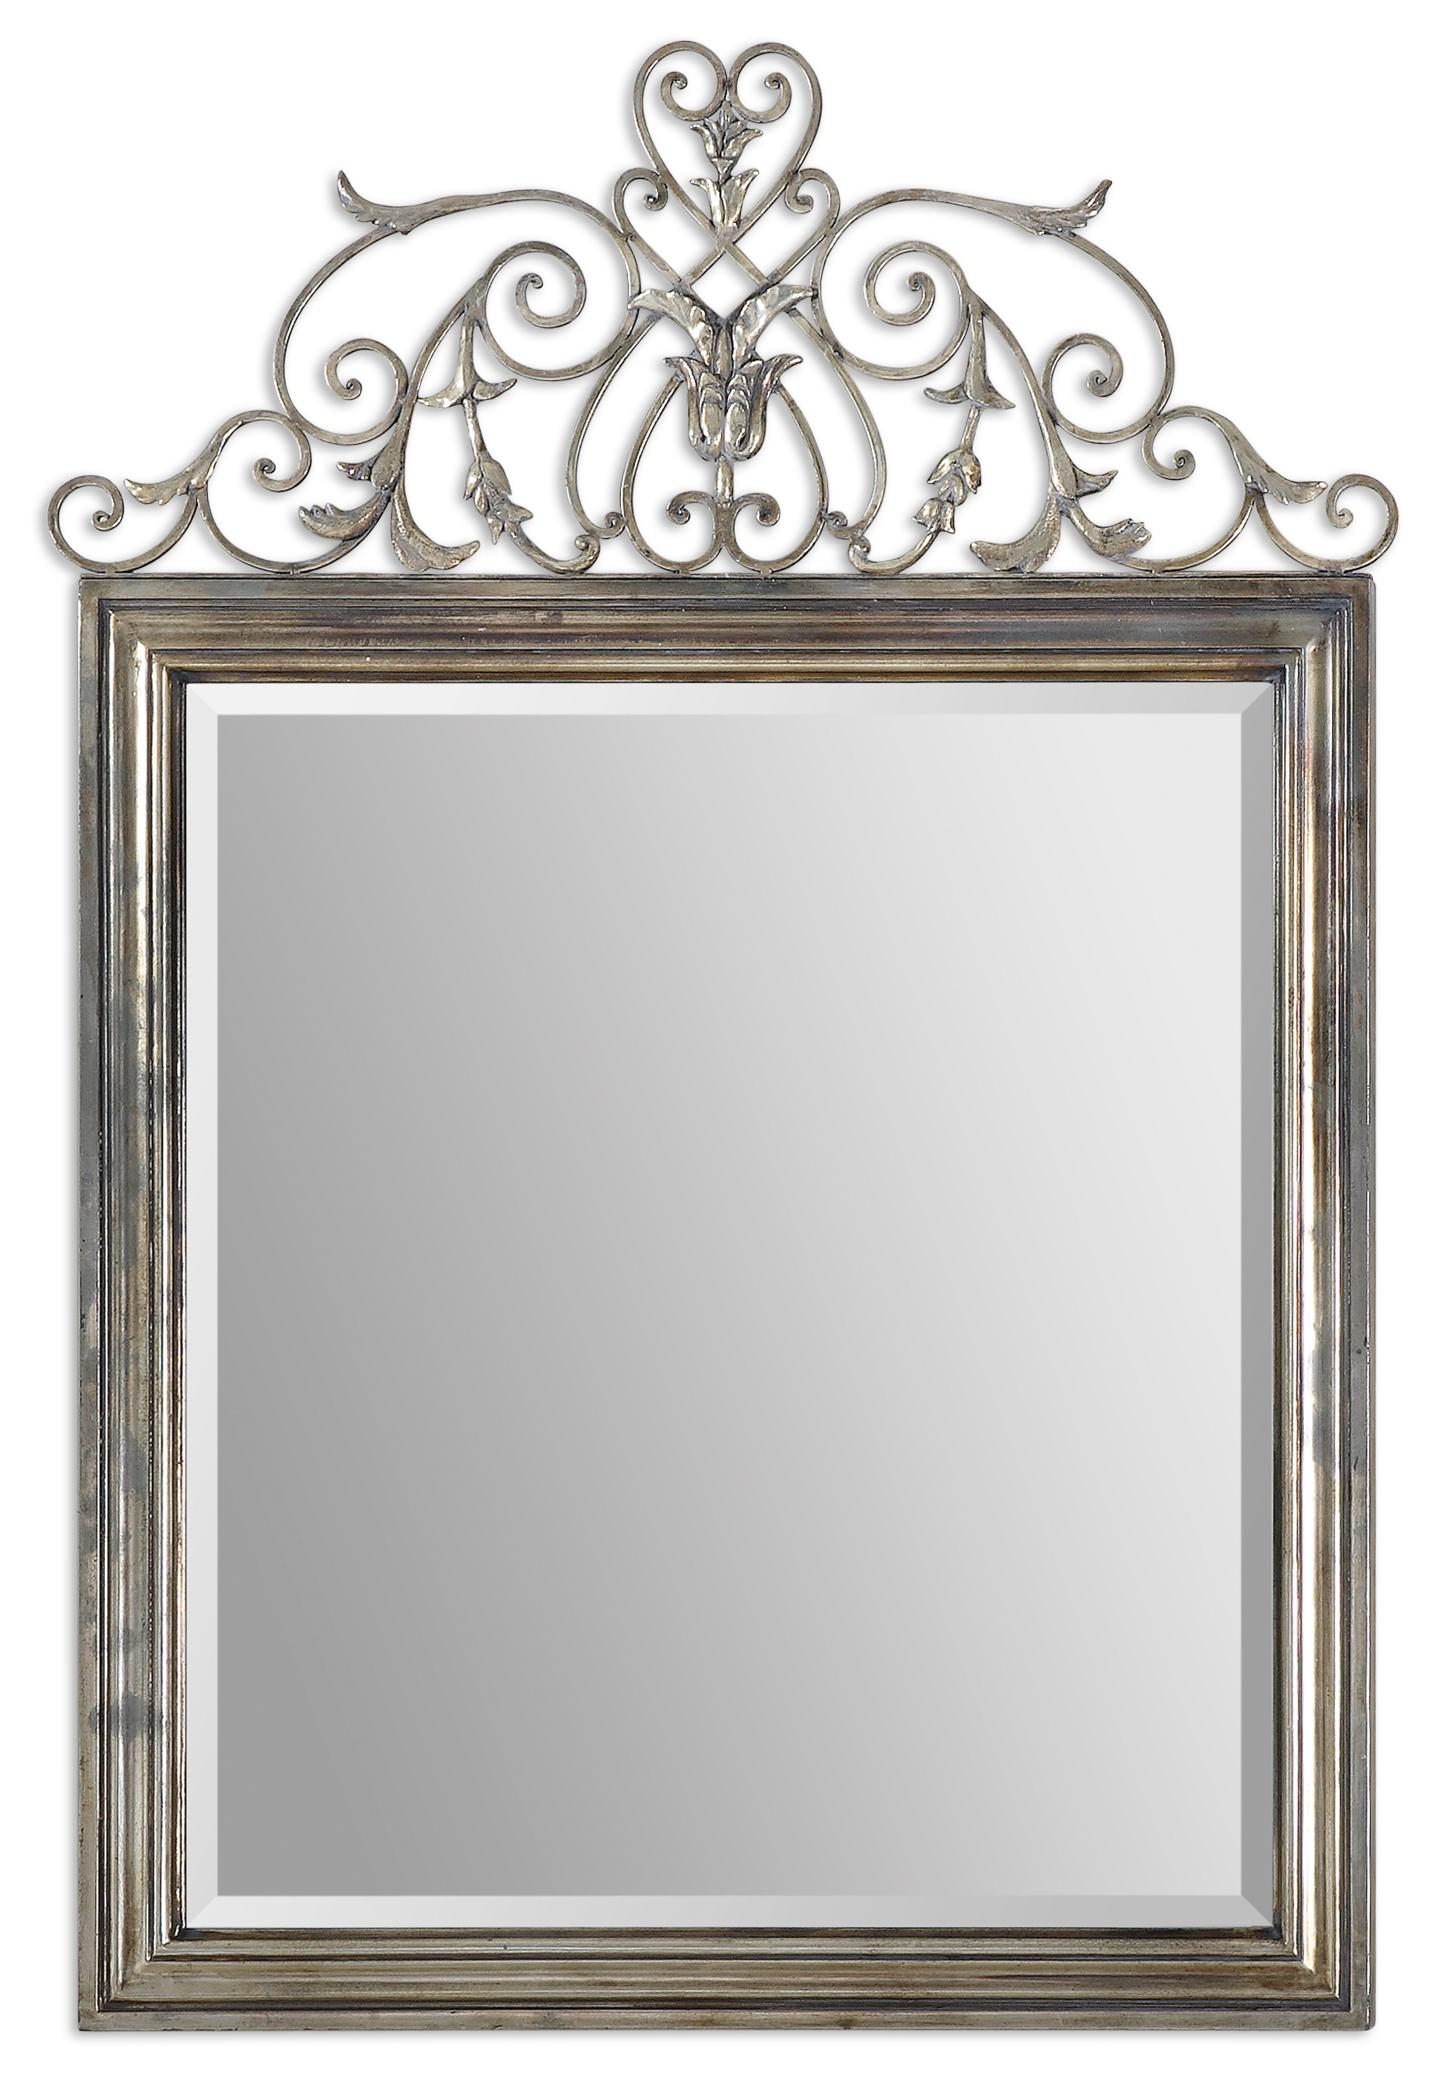 Uttermost Mirrors Kissara Metal Mirror - Item Number: 12865